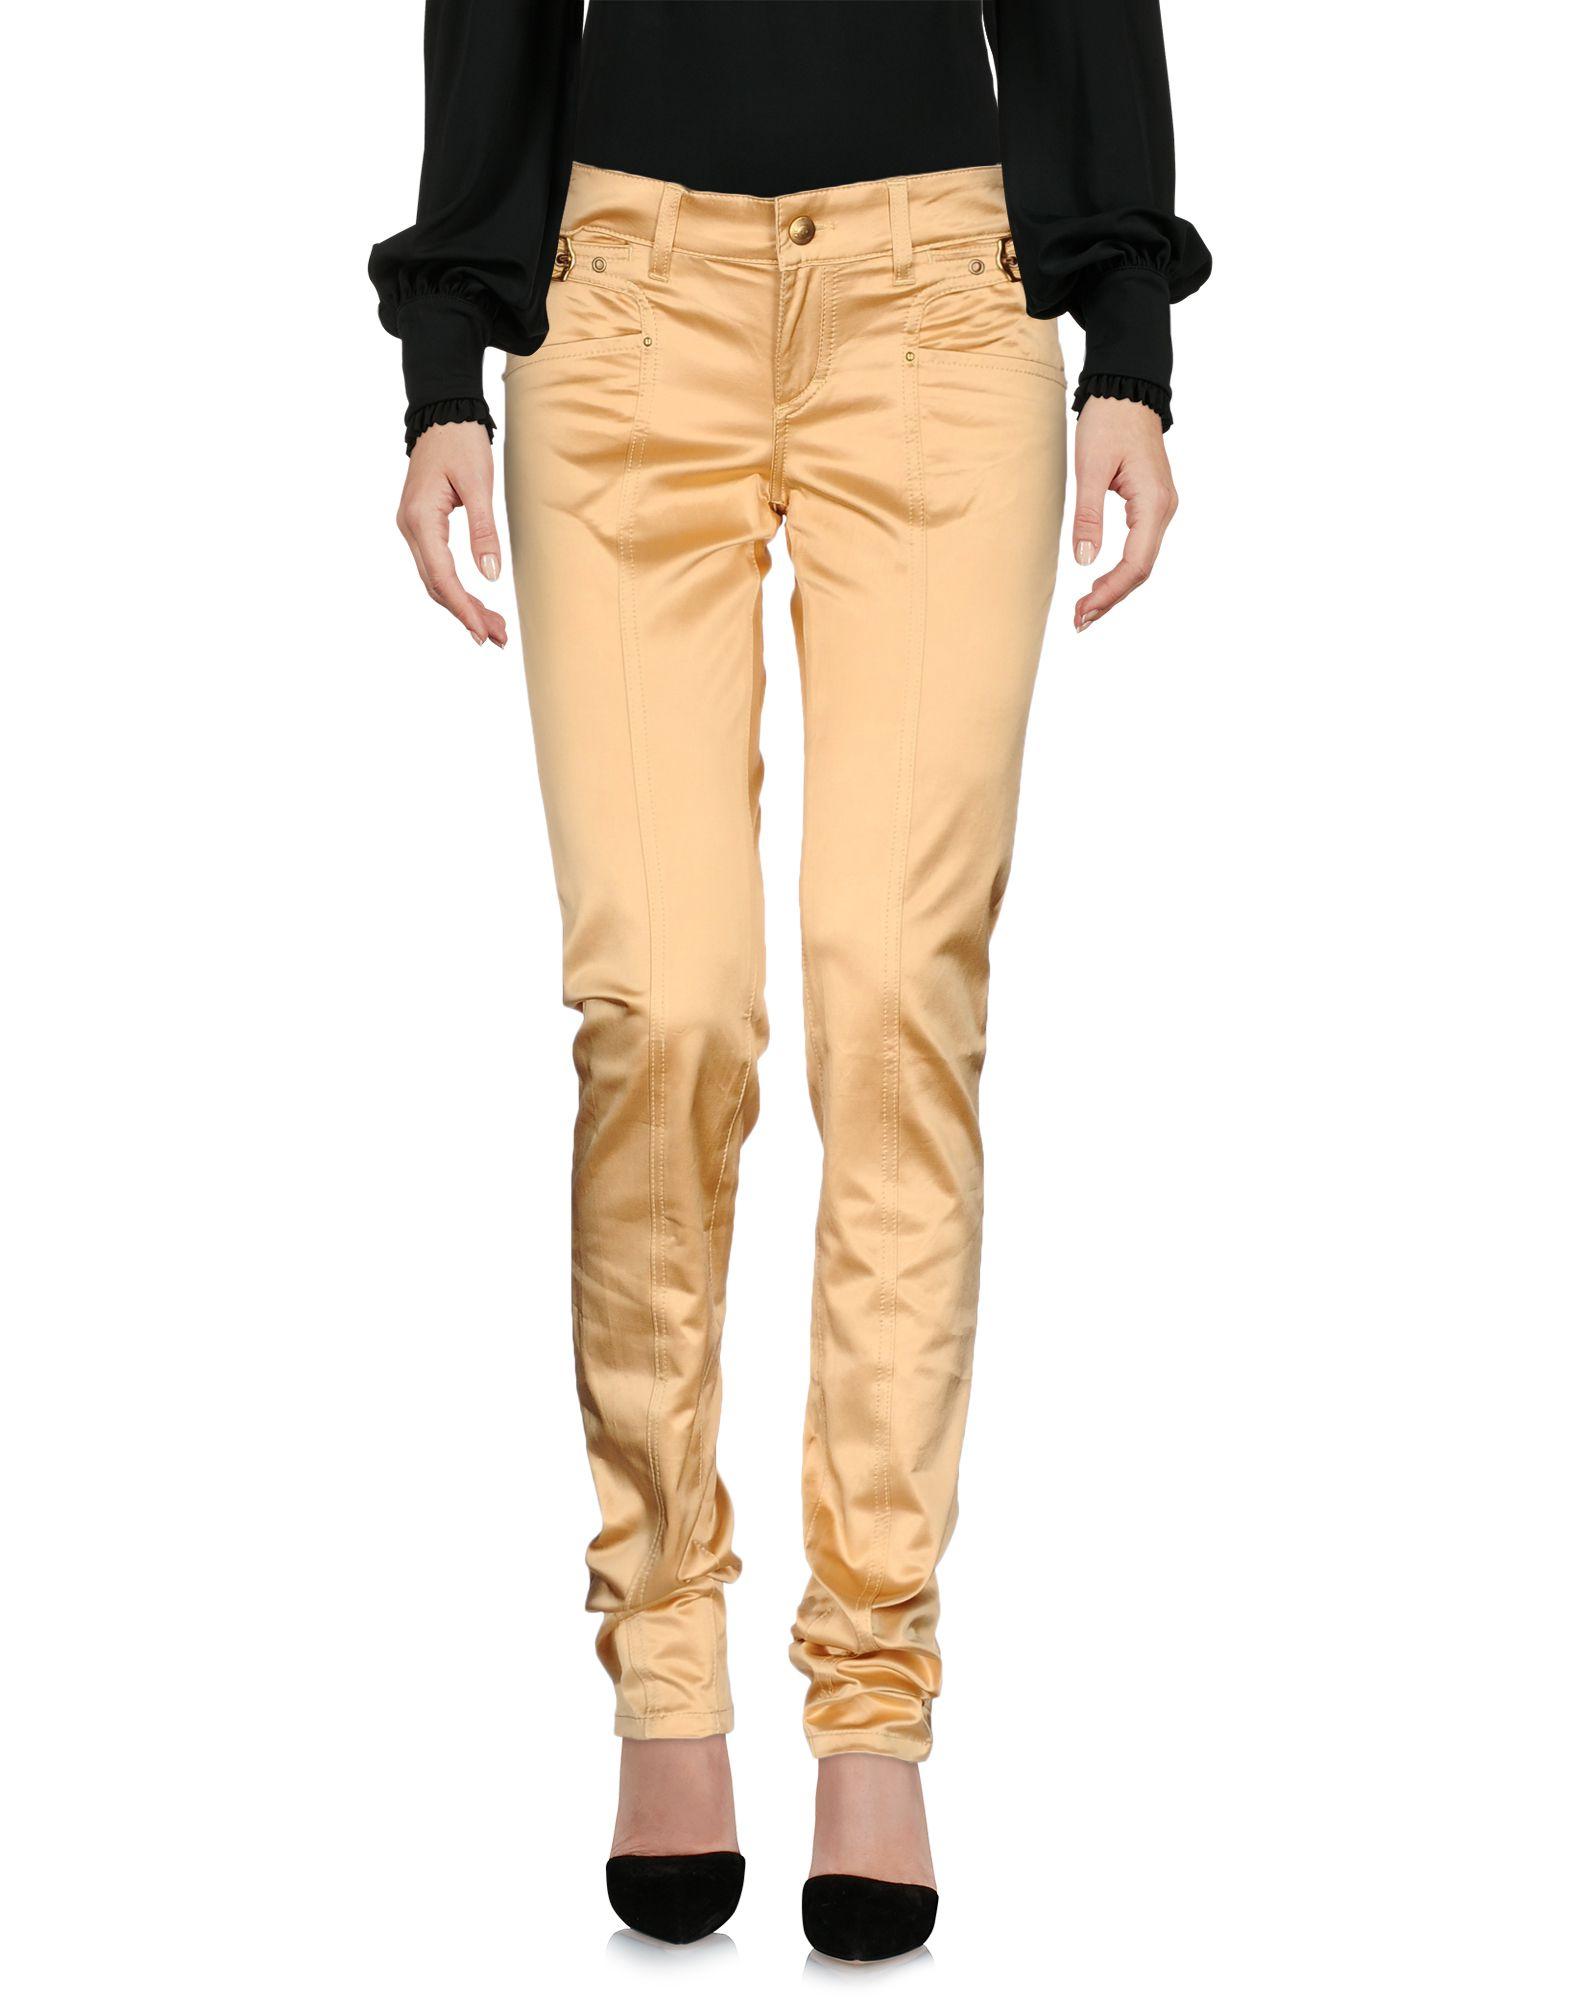 Pantalone Just Cavalli Donna - Acquista online su WIpilfSfD